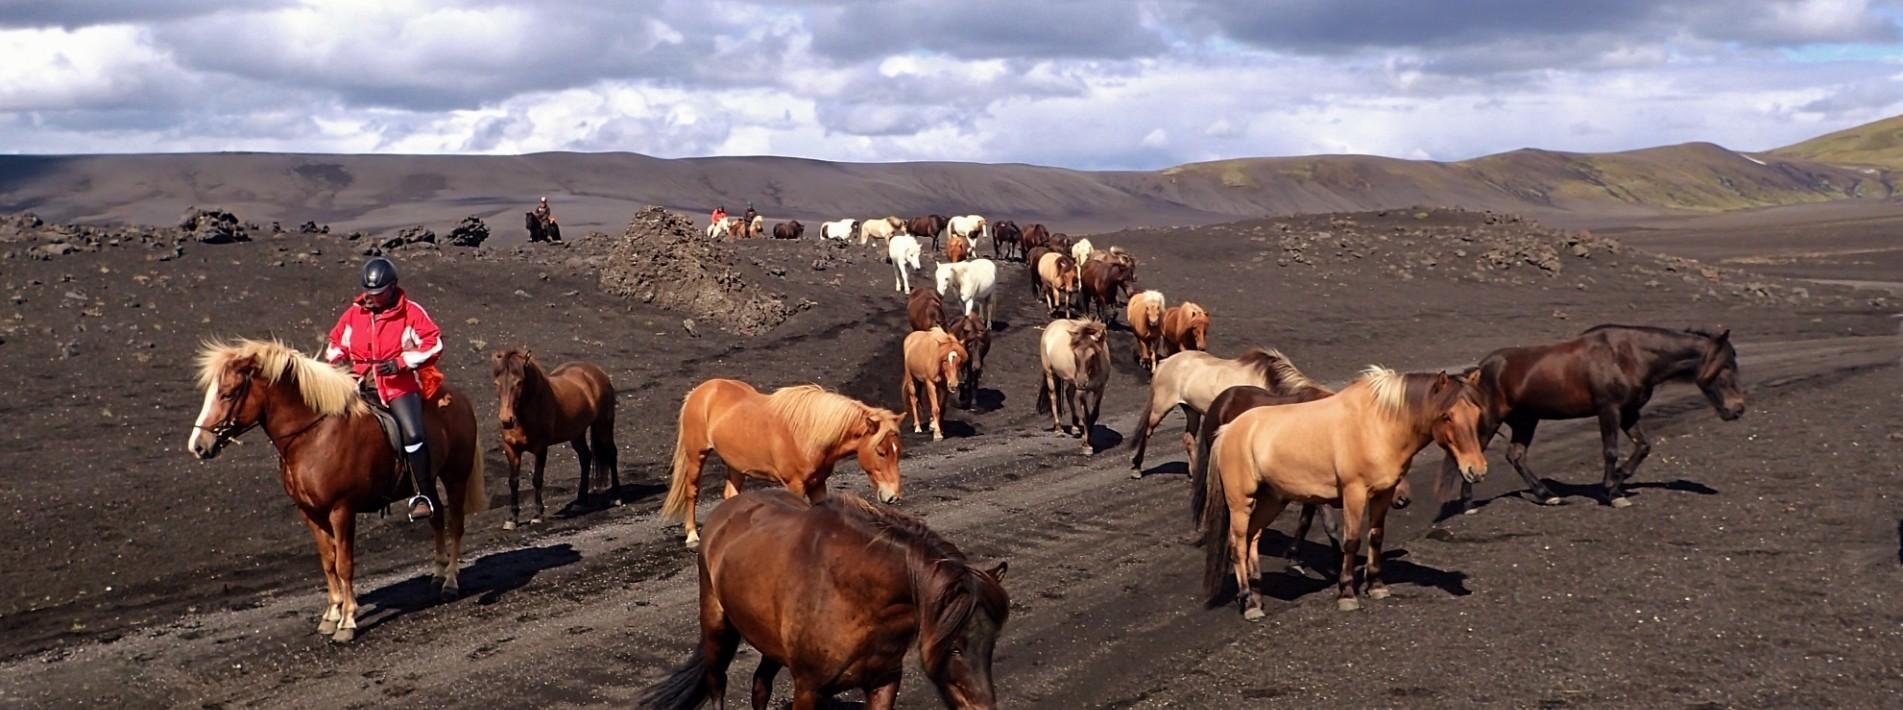 Pferdeherde auf Lavafeld in Island